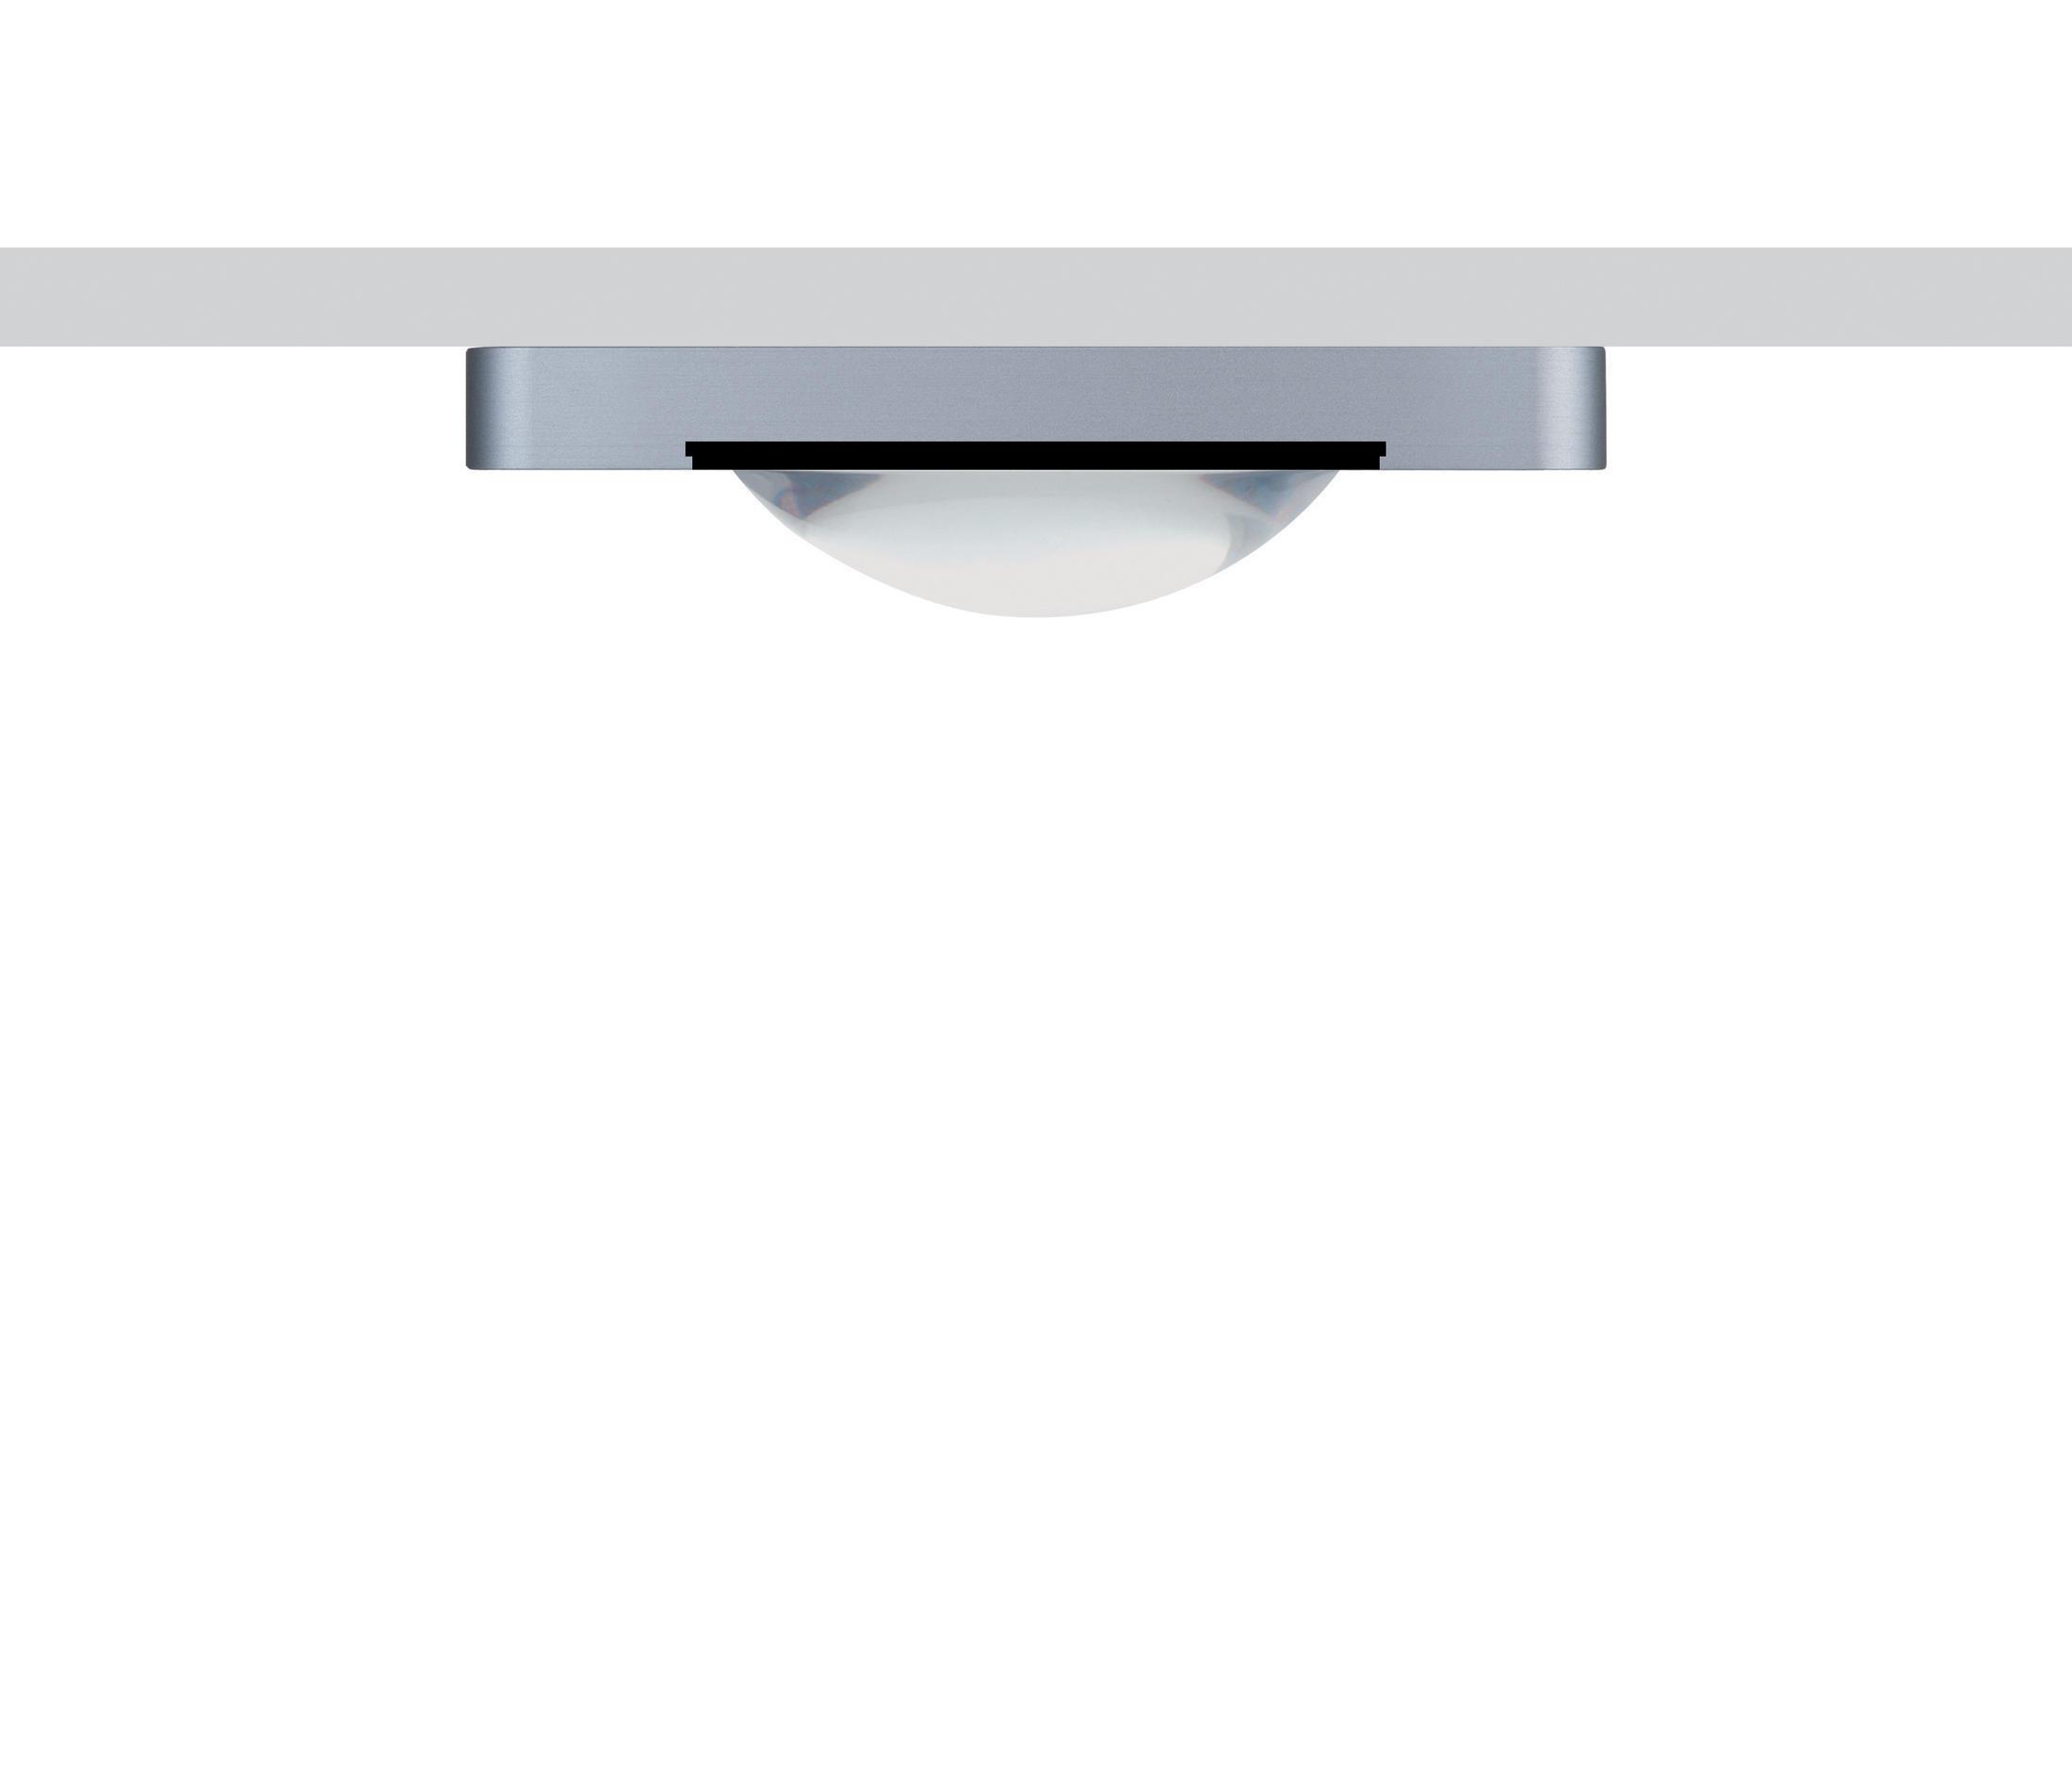 Led base 1 ceiling light by grimmeisen licht ceiling lights